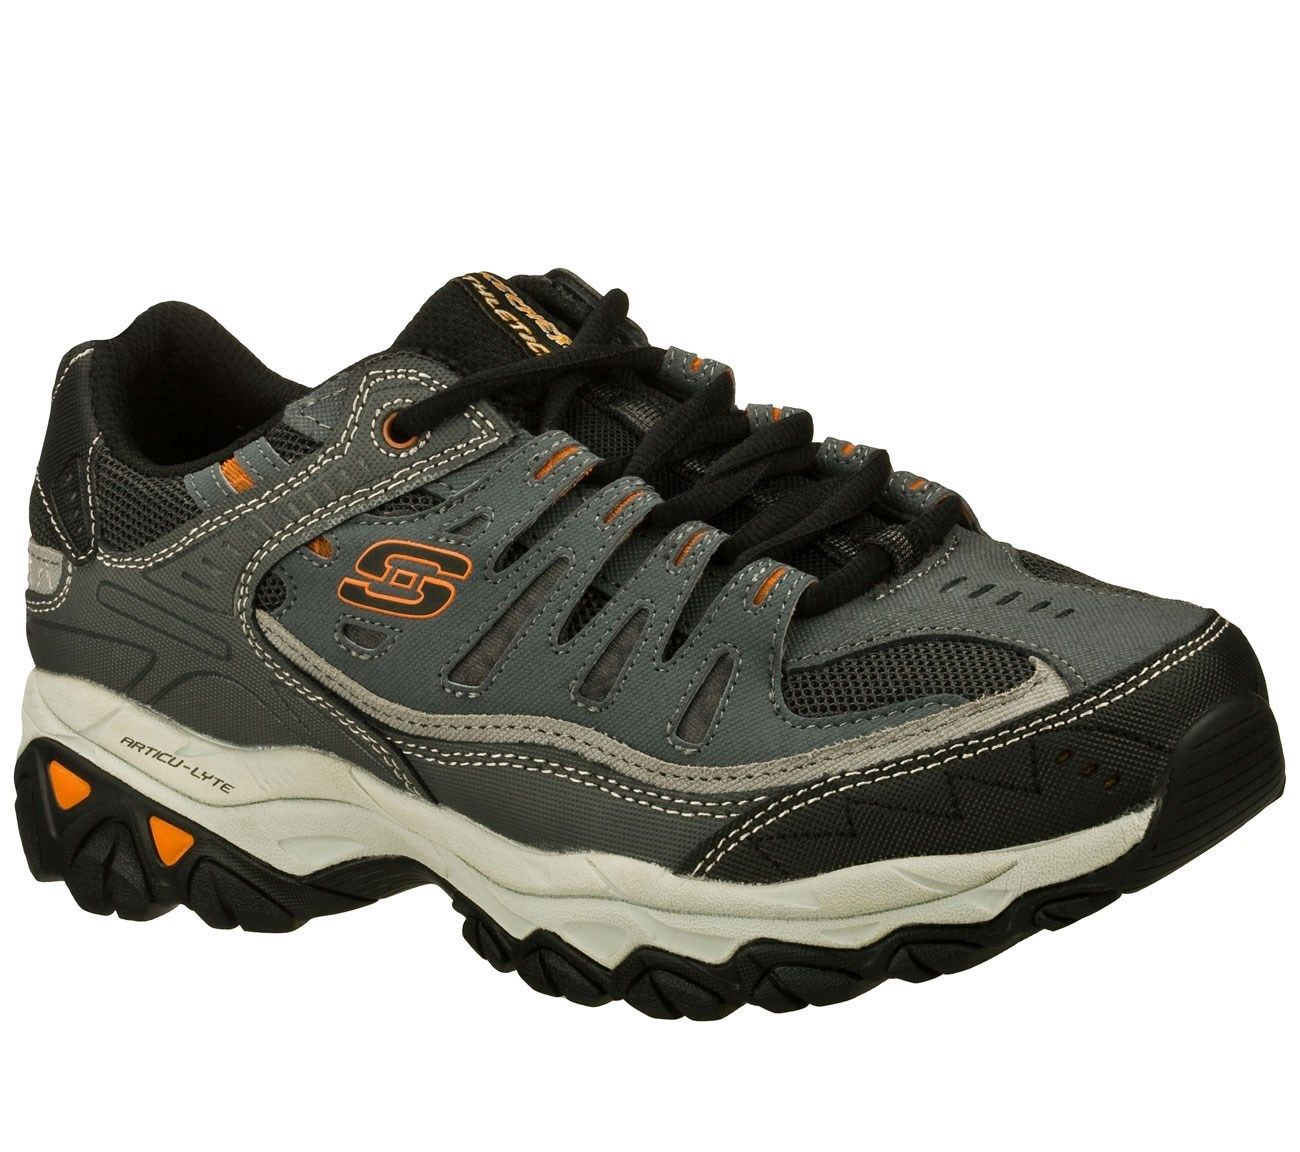 7bf13047f7ec Skechers - Skechers 50125EWW CCGY Men s AFTER BURN-MEMORY FIT Training Shoes  (EXTRA WIDE) - Walmart.com